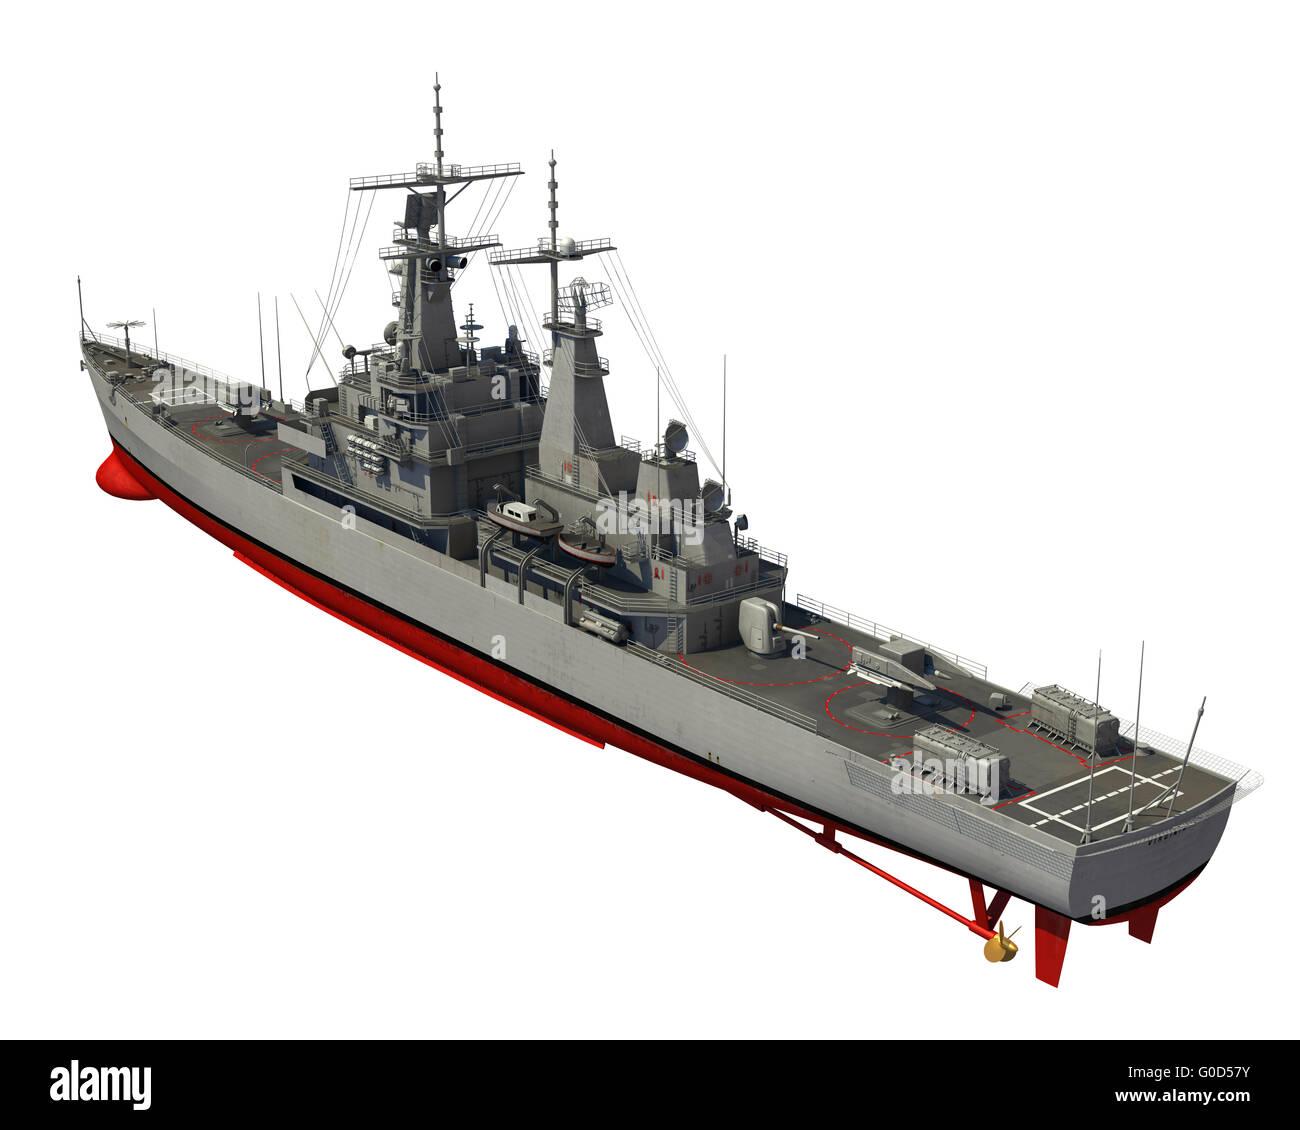 American Modern Warship Over White Background. 3D Illustration. - Stock Image